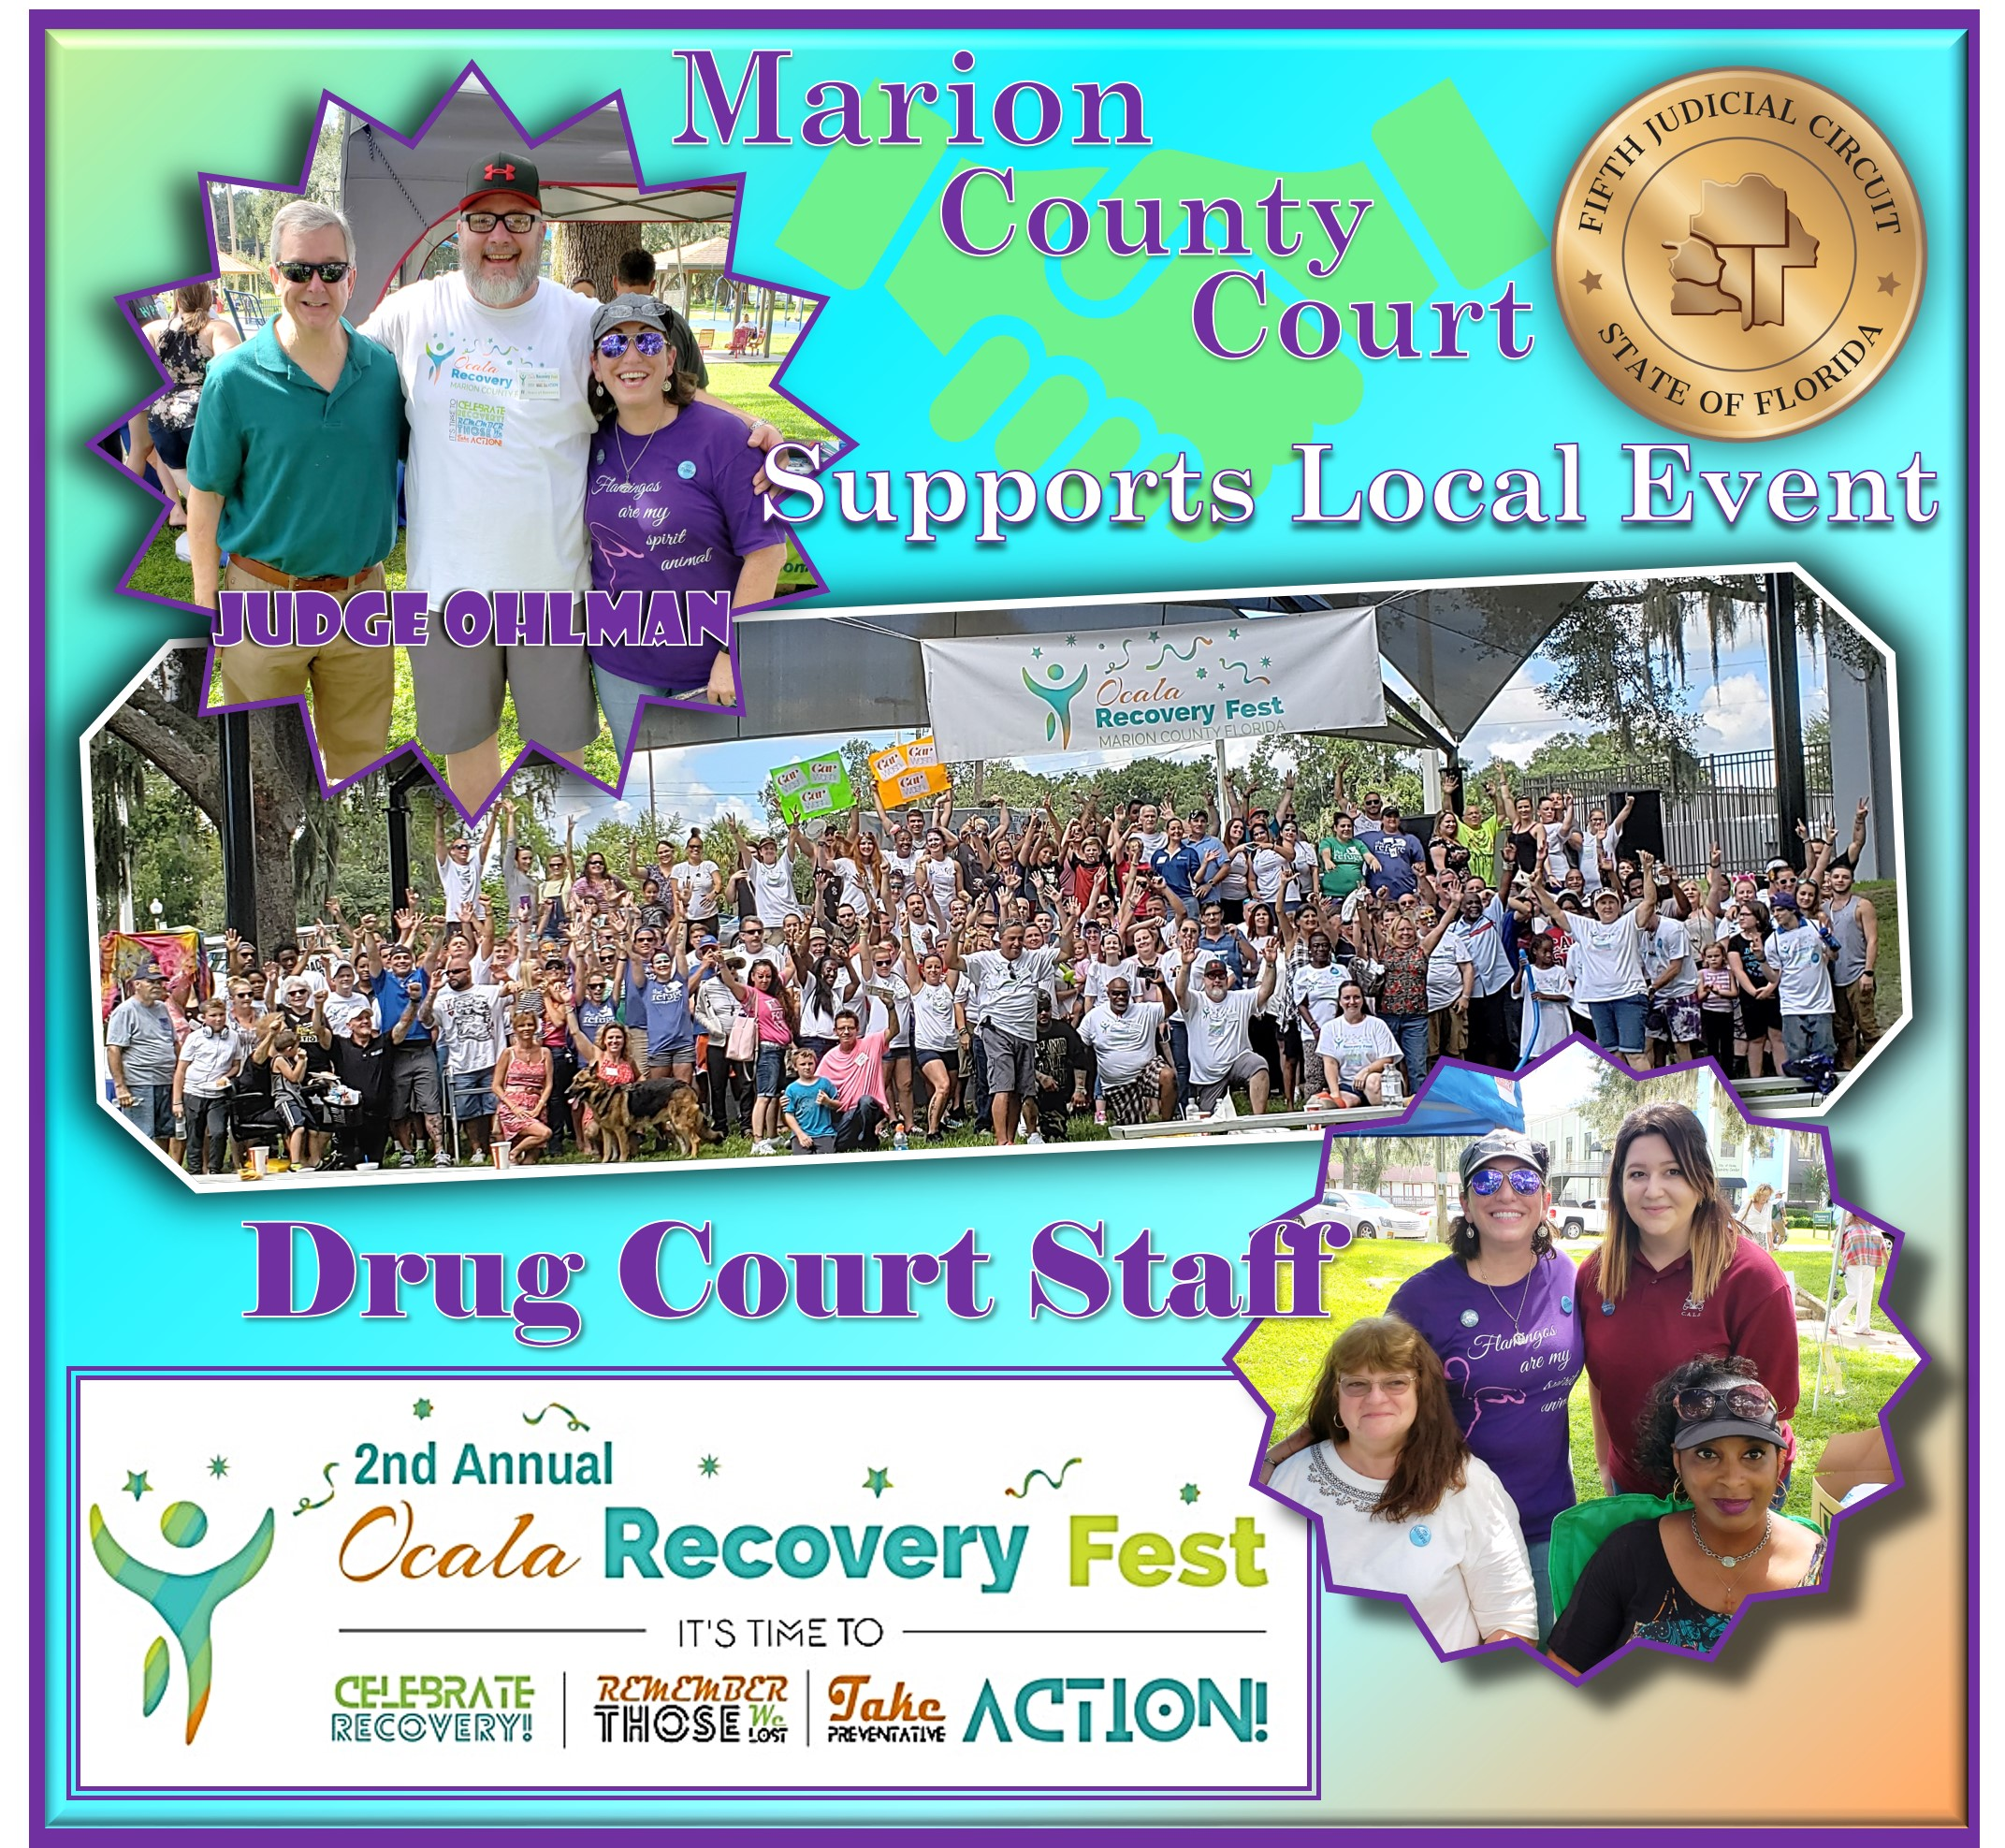 Home - State of Florida Fifth Judicial Circuit